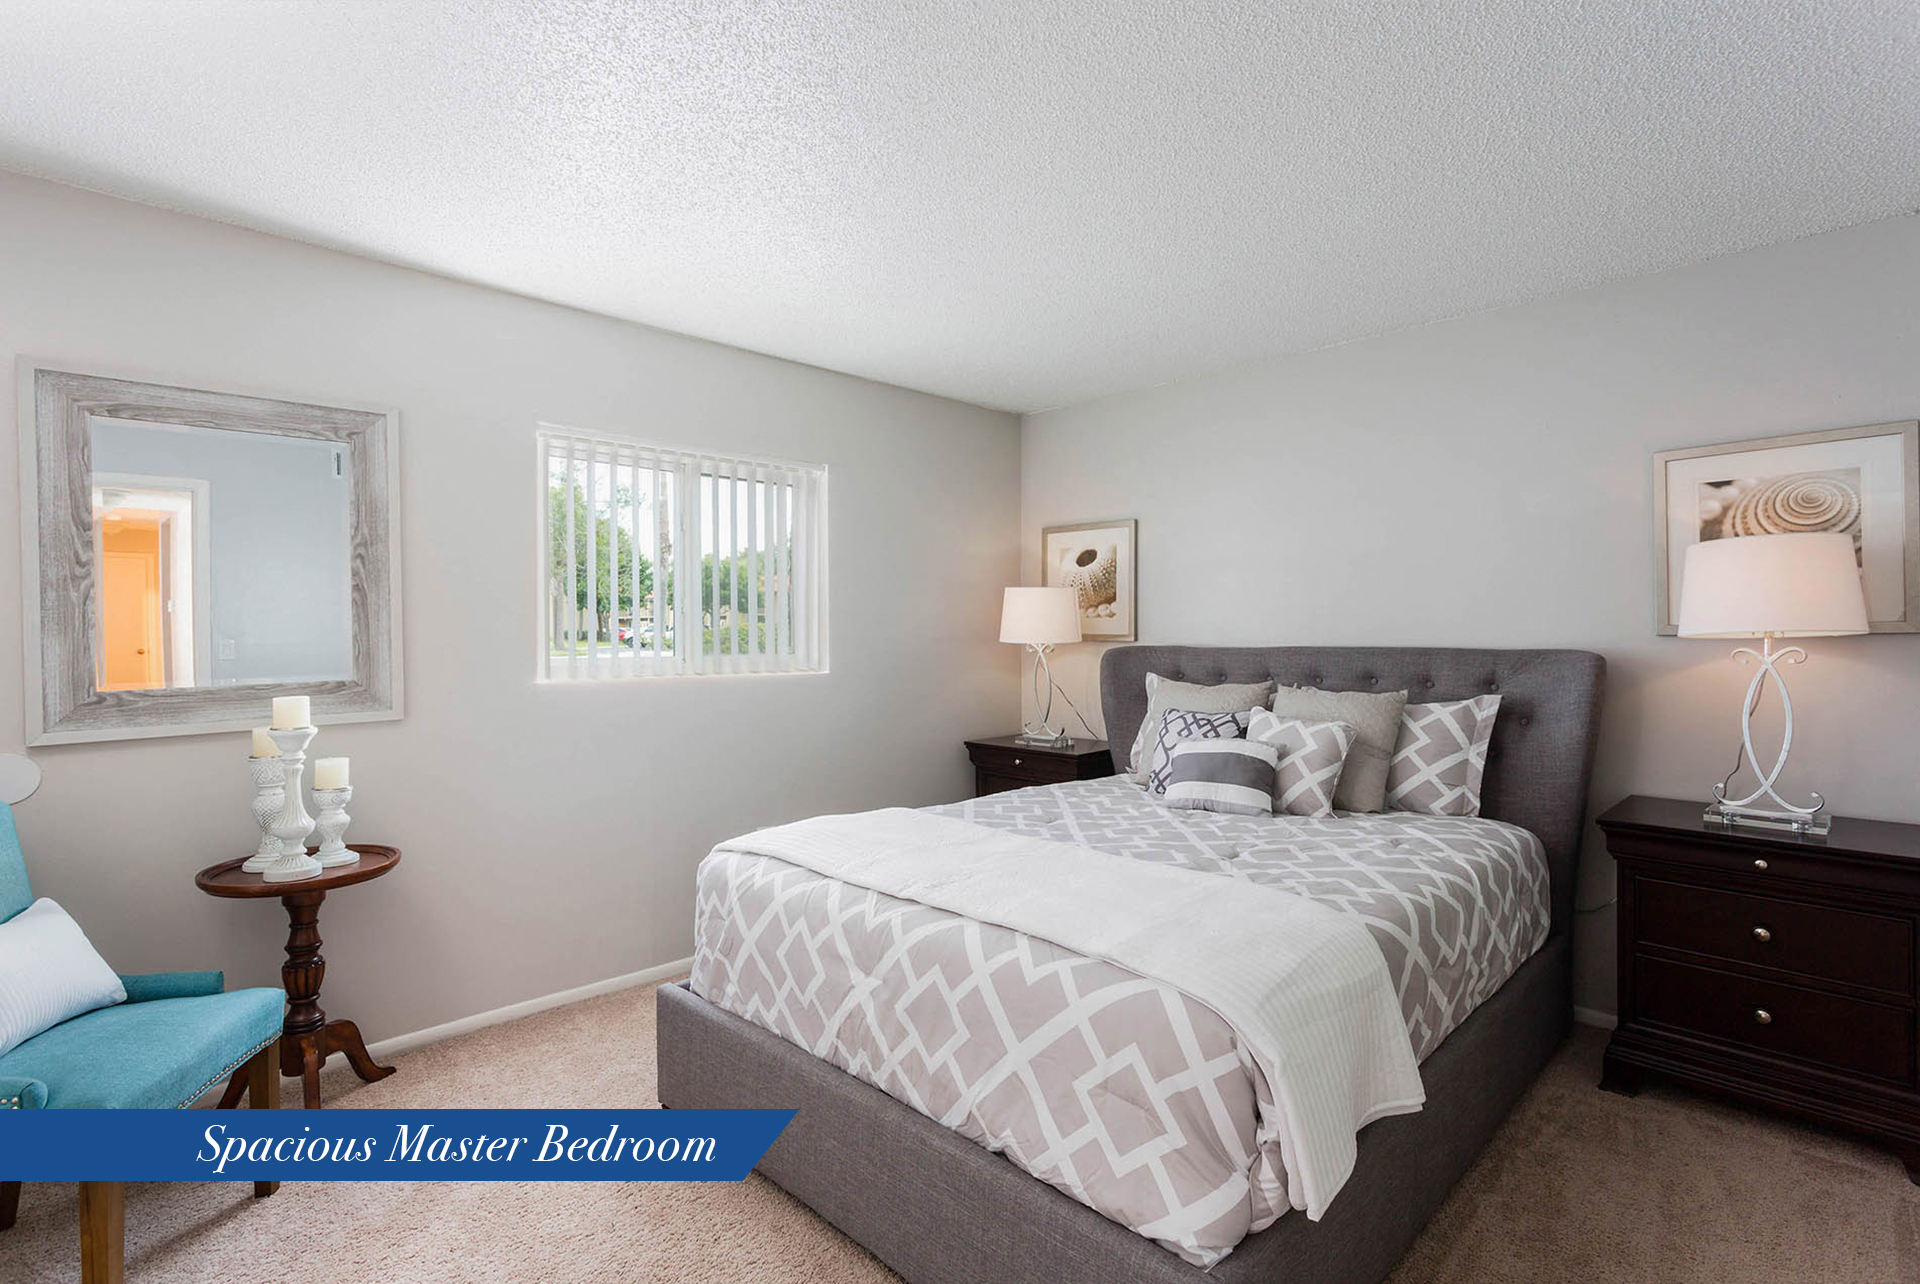 2b1-5b-930-bc-20bedroom-20ll